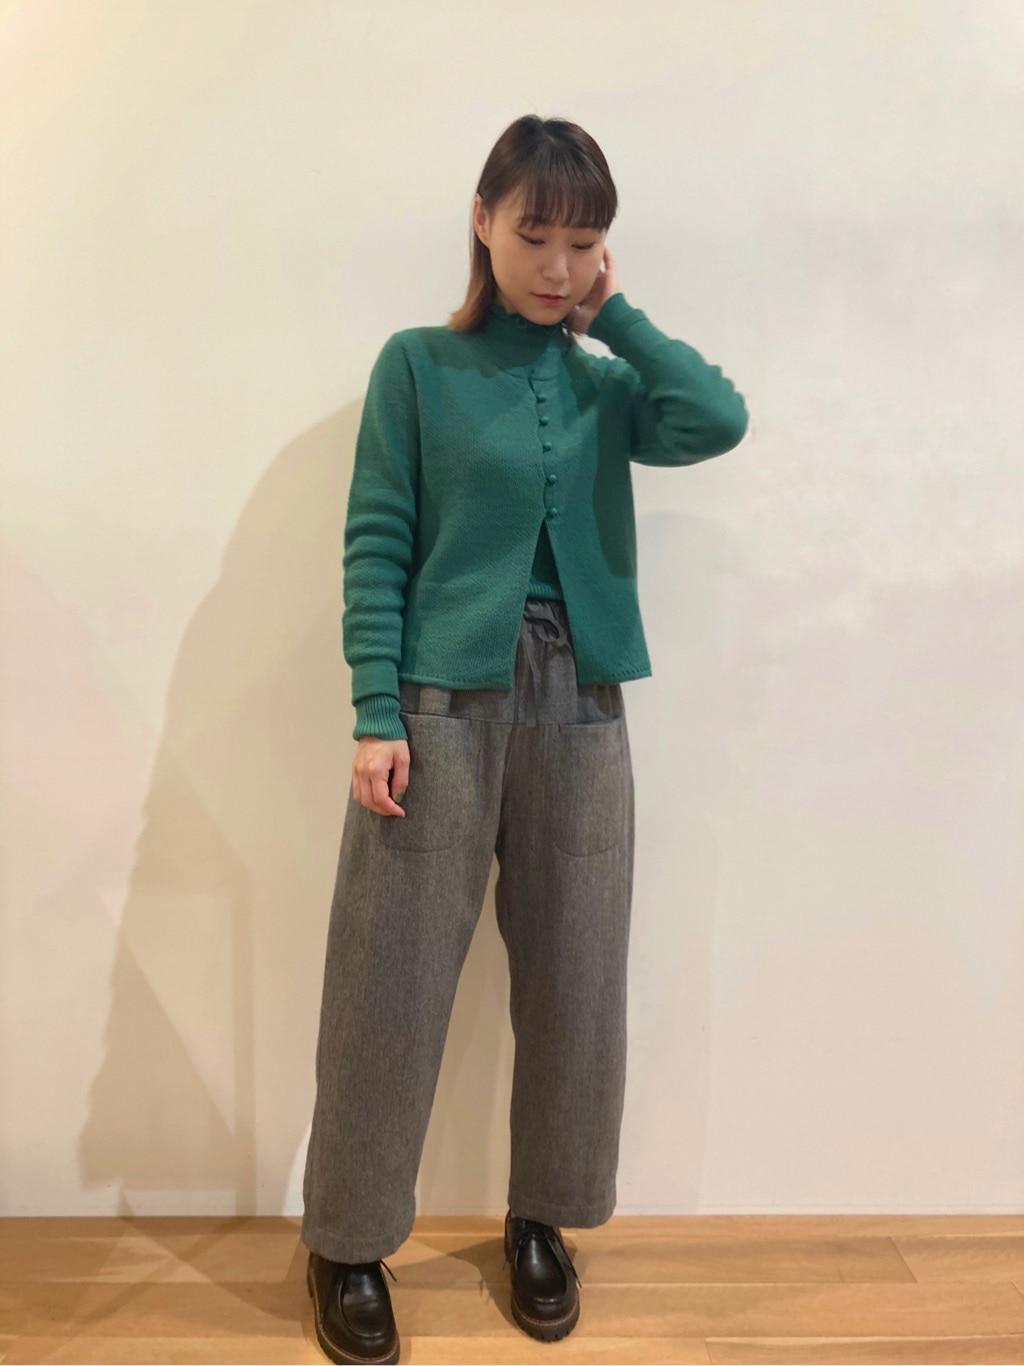 bulle de savon KITTE丸の内 身長:159cm 2020.10.15